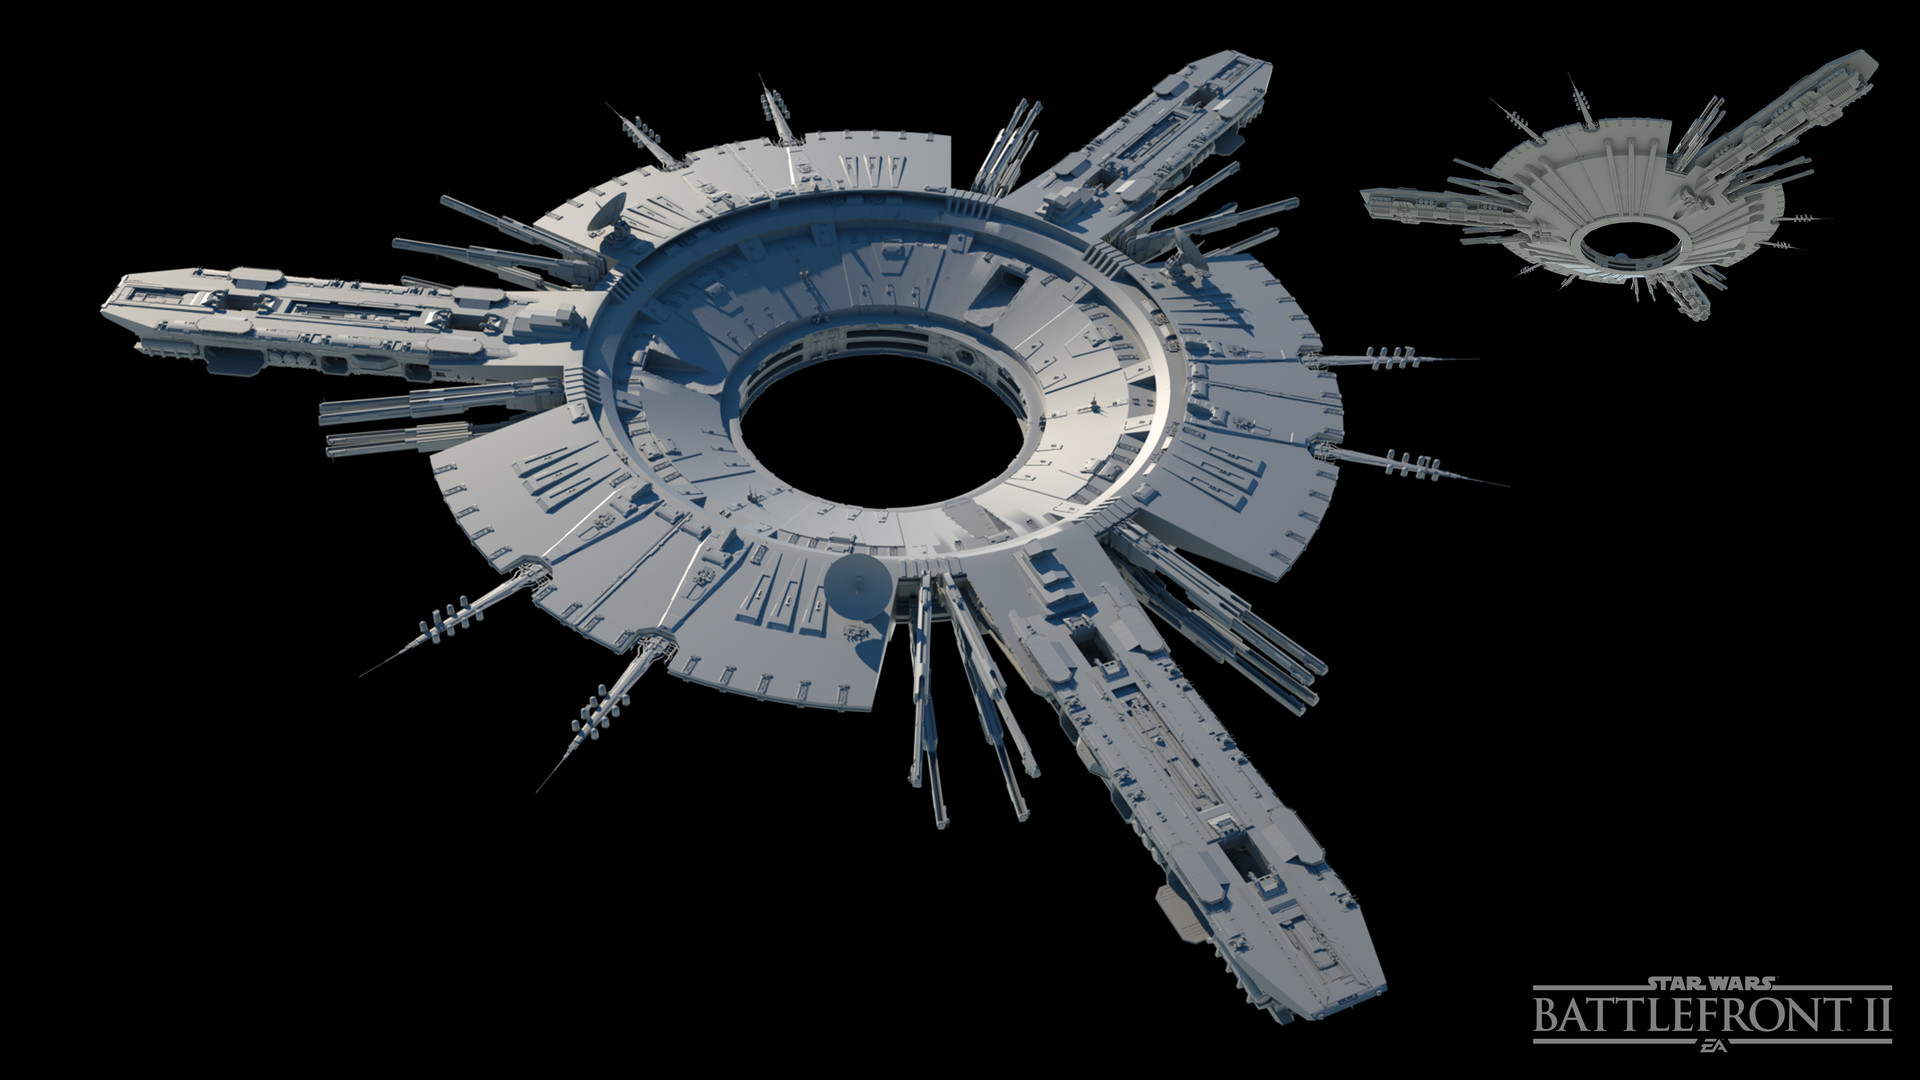 Darius kalinauskas fondor dock starwars conceptart battlefront 13